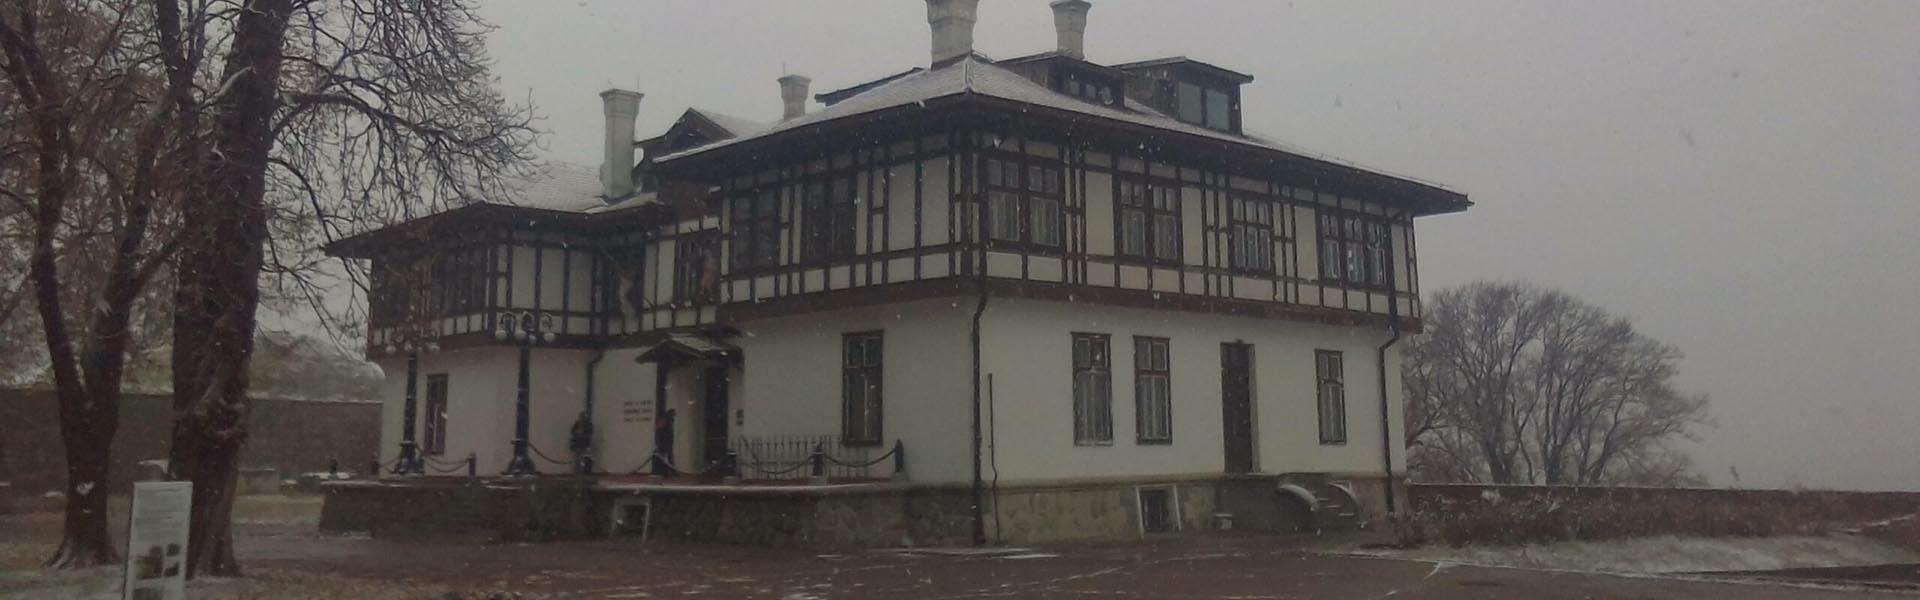 Dostava hrane Profesorska kolonija | Beograd